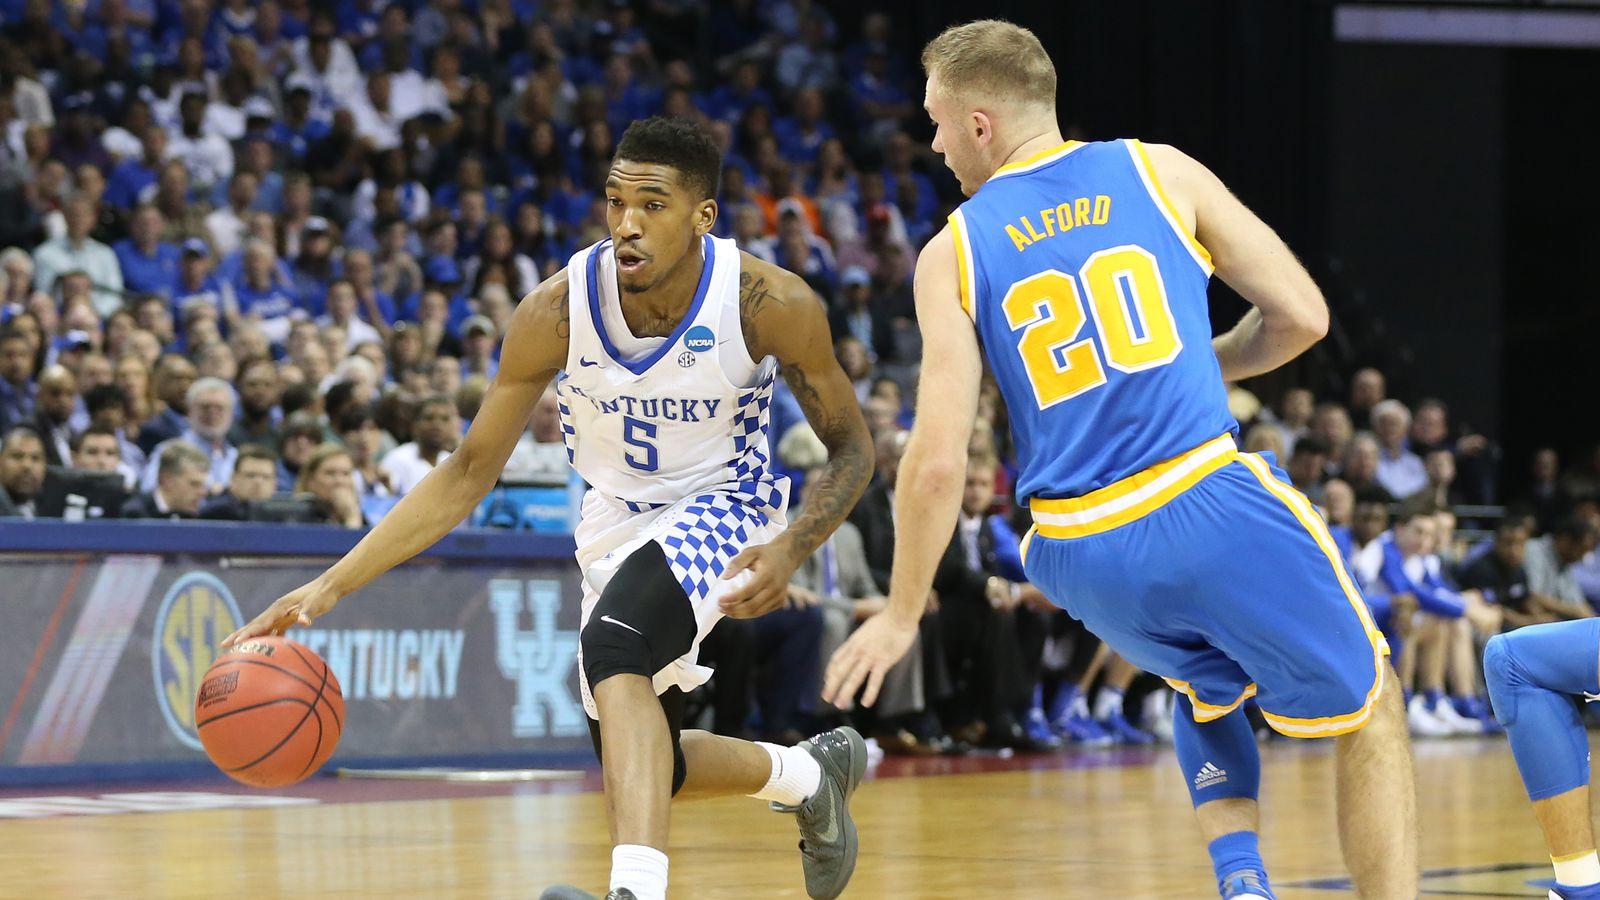 Uk Basketball: NBA Draft 2017: Malik Monk Says He'd Be 'perfect Fit' Next